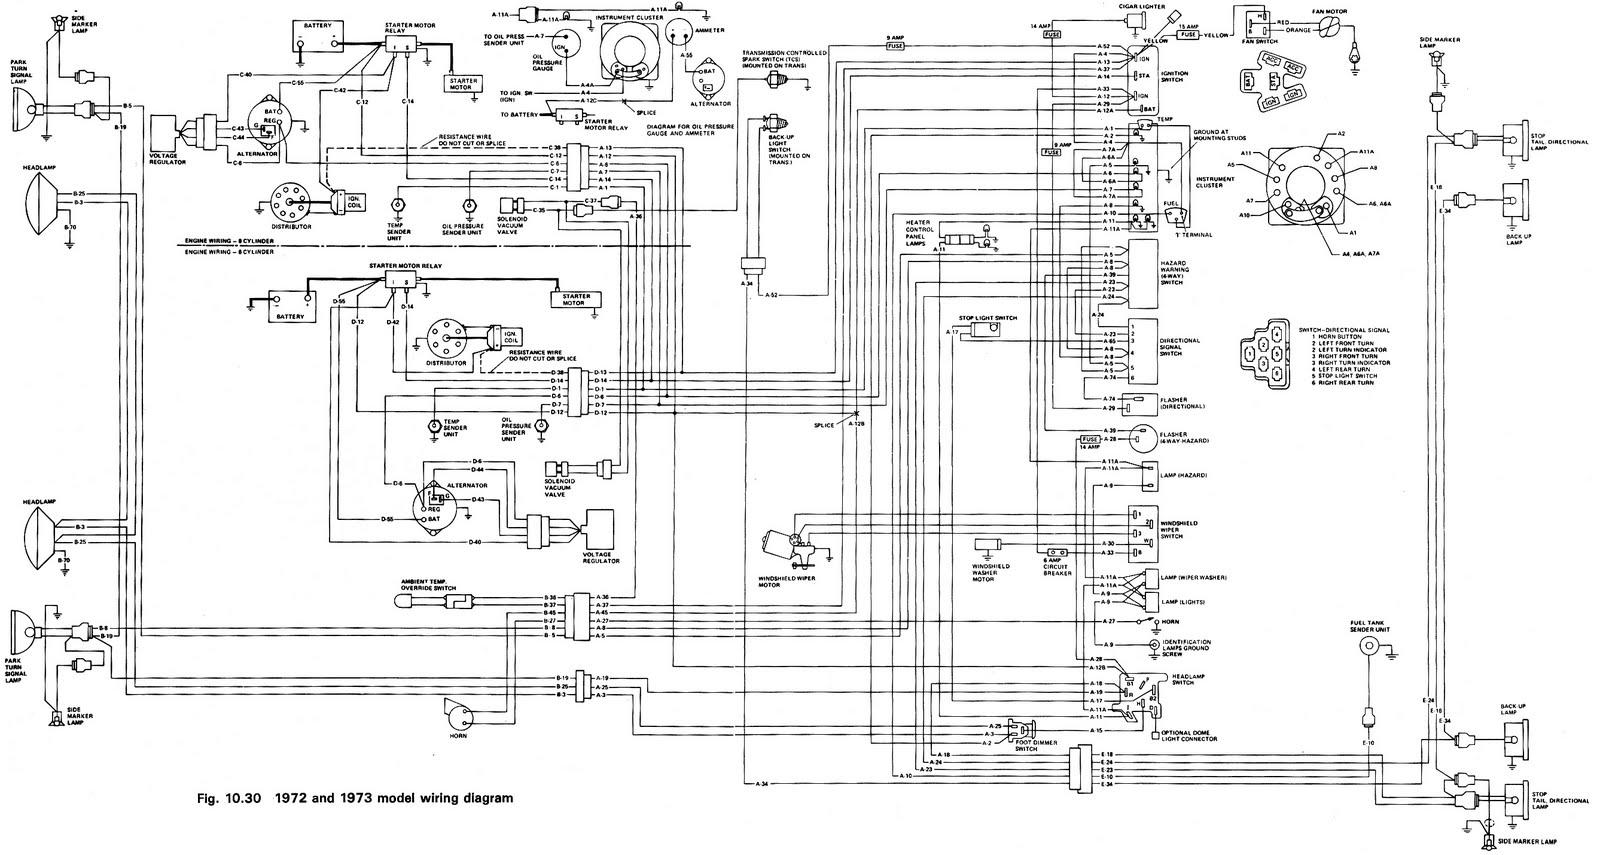 1970 Cj5 Wiring Diagram Cj 1976 1977jpg